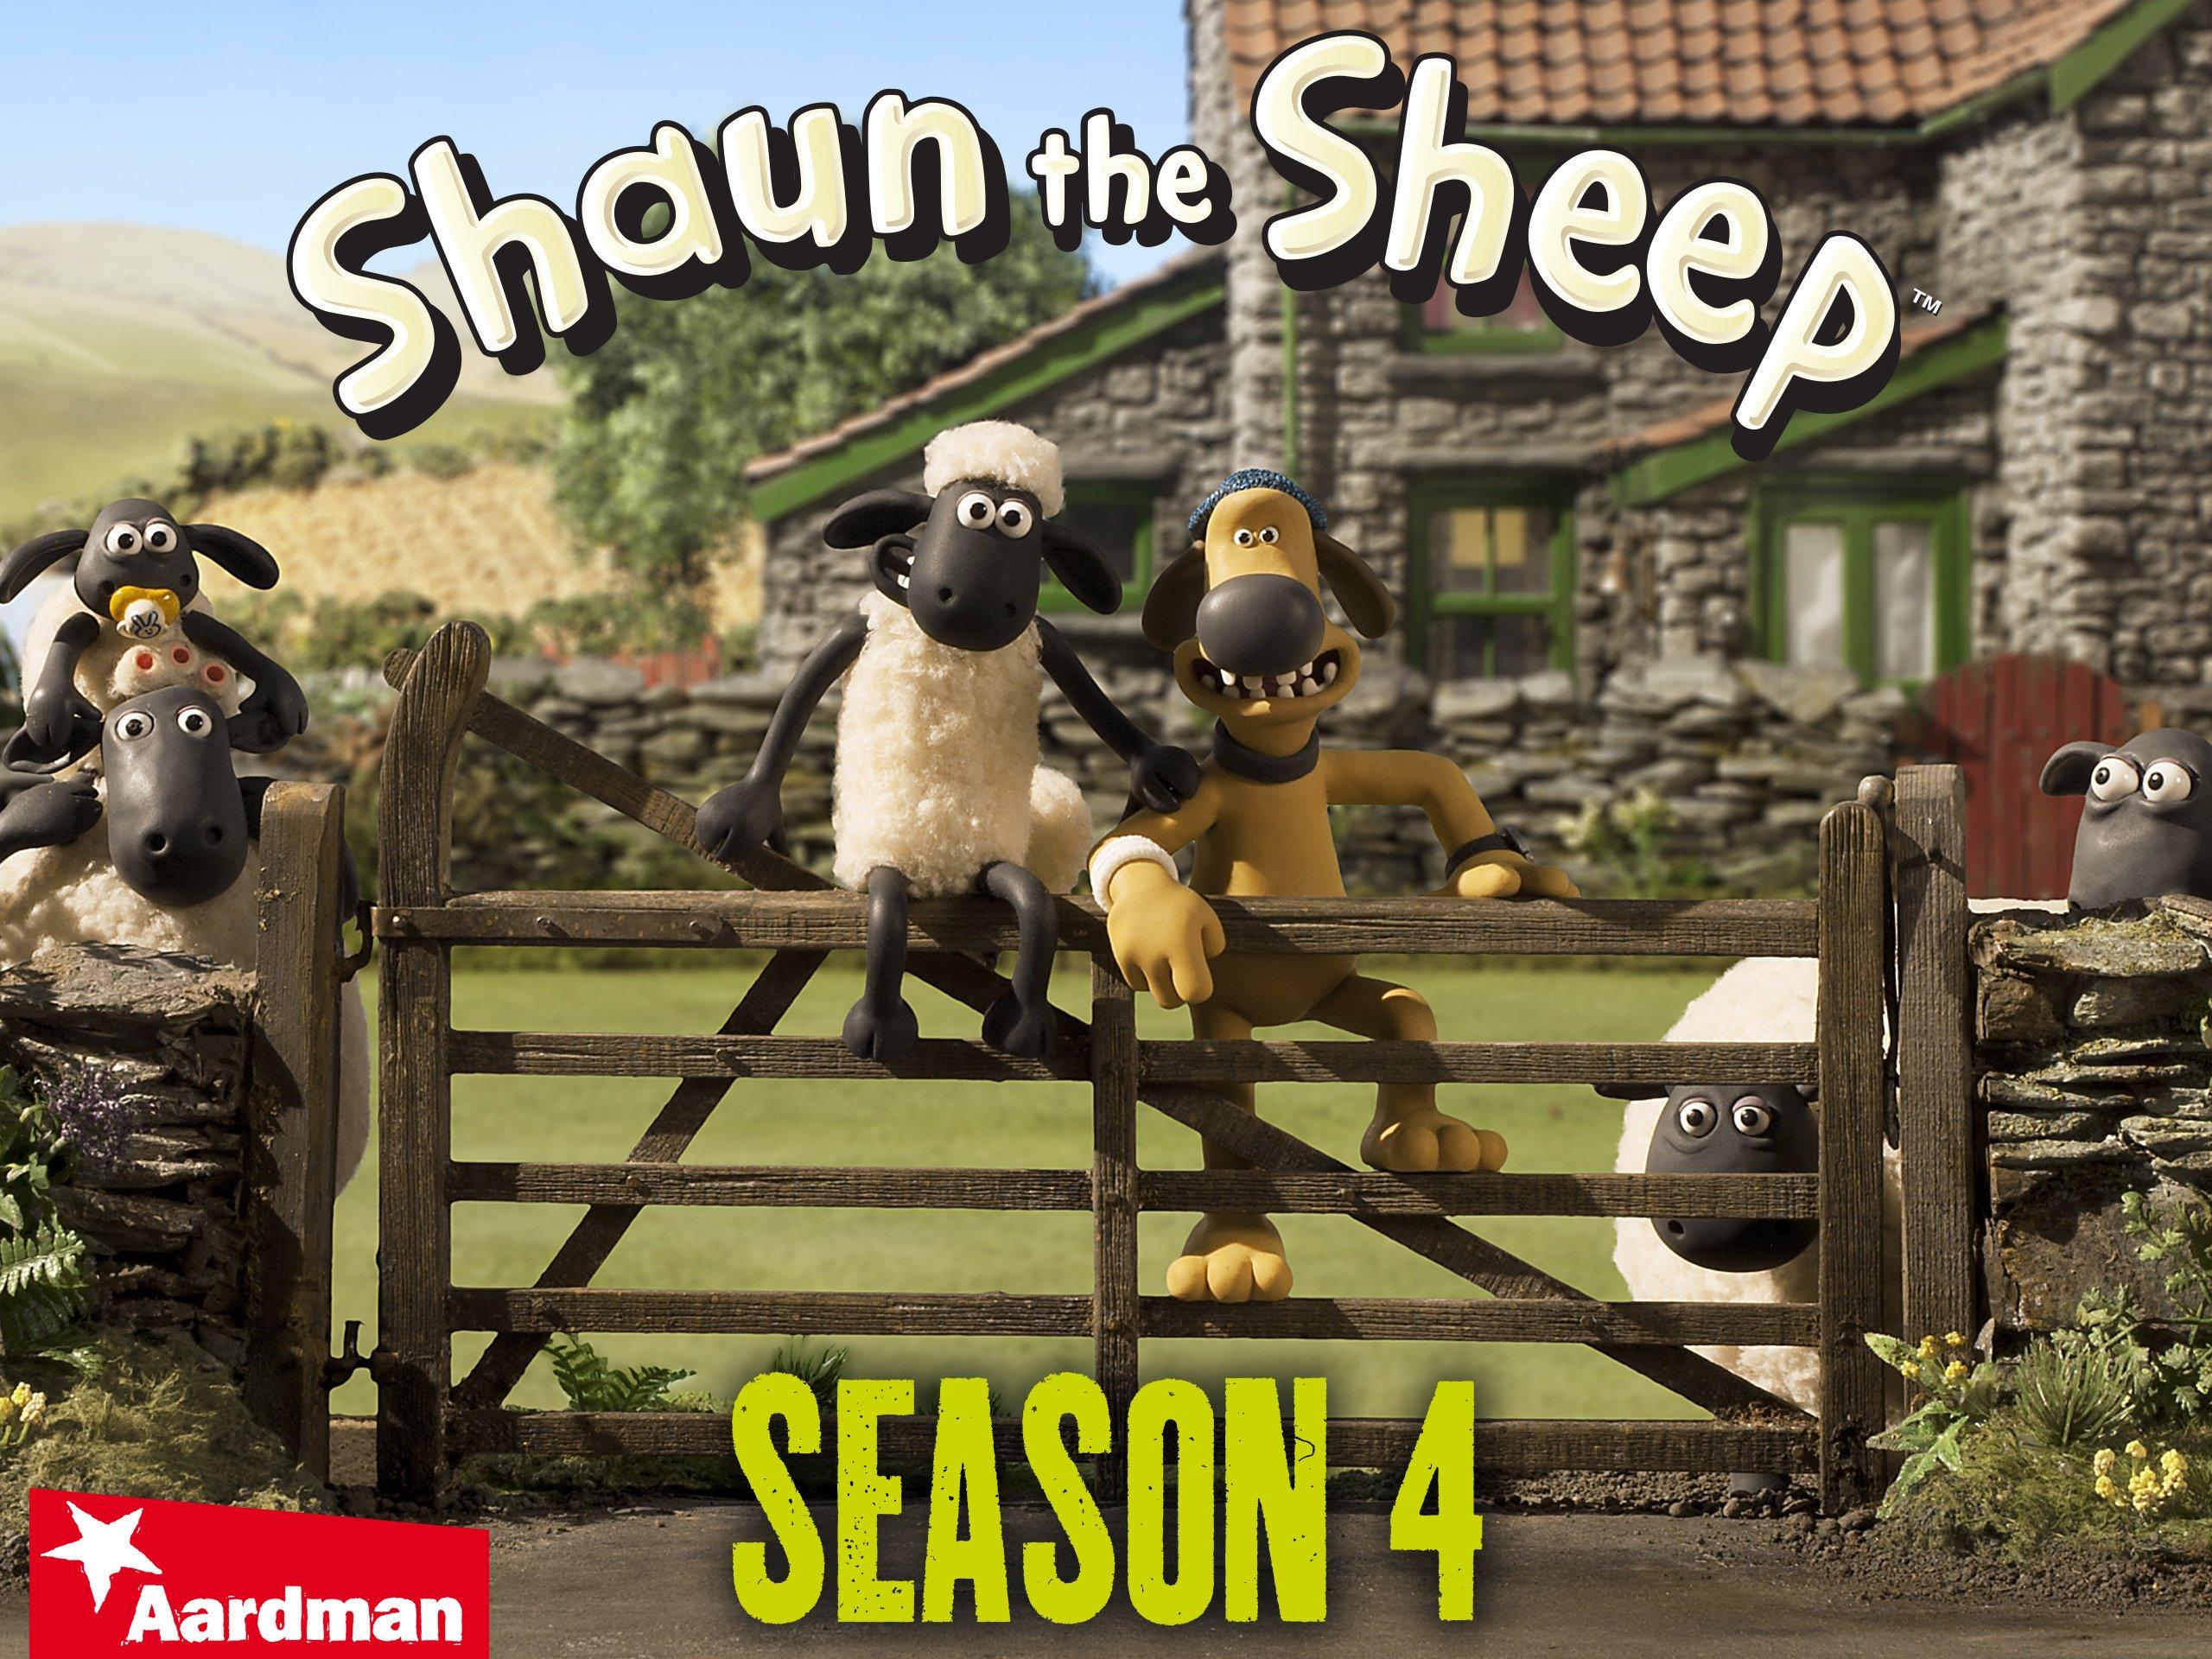 shaun the sheep video mp4 free download